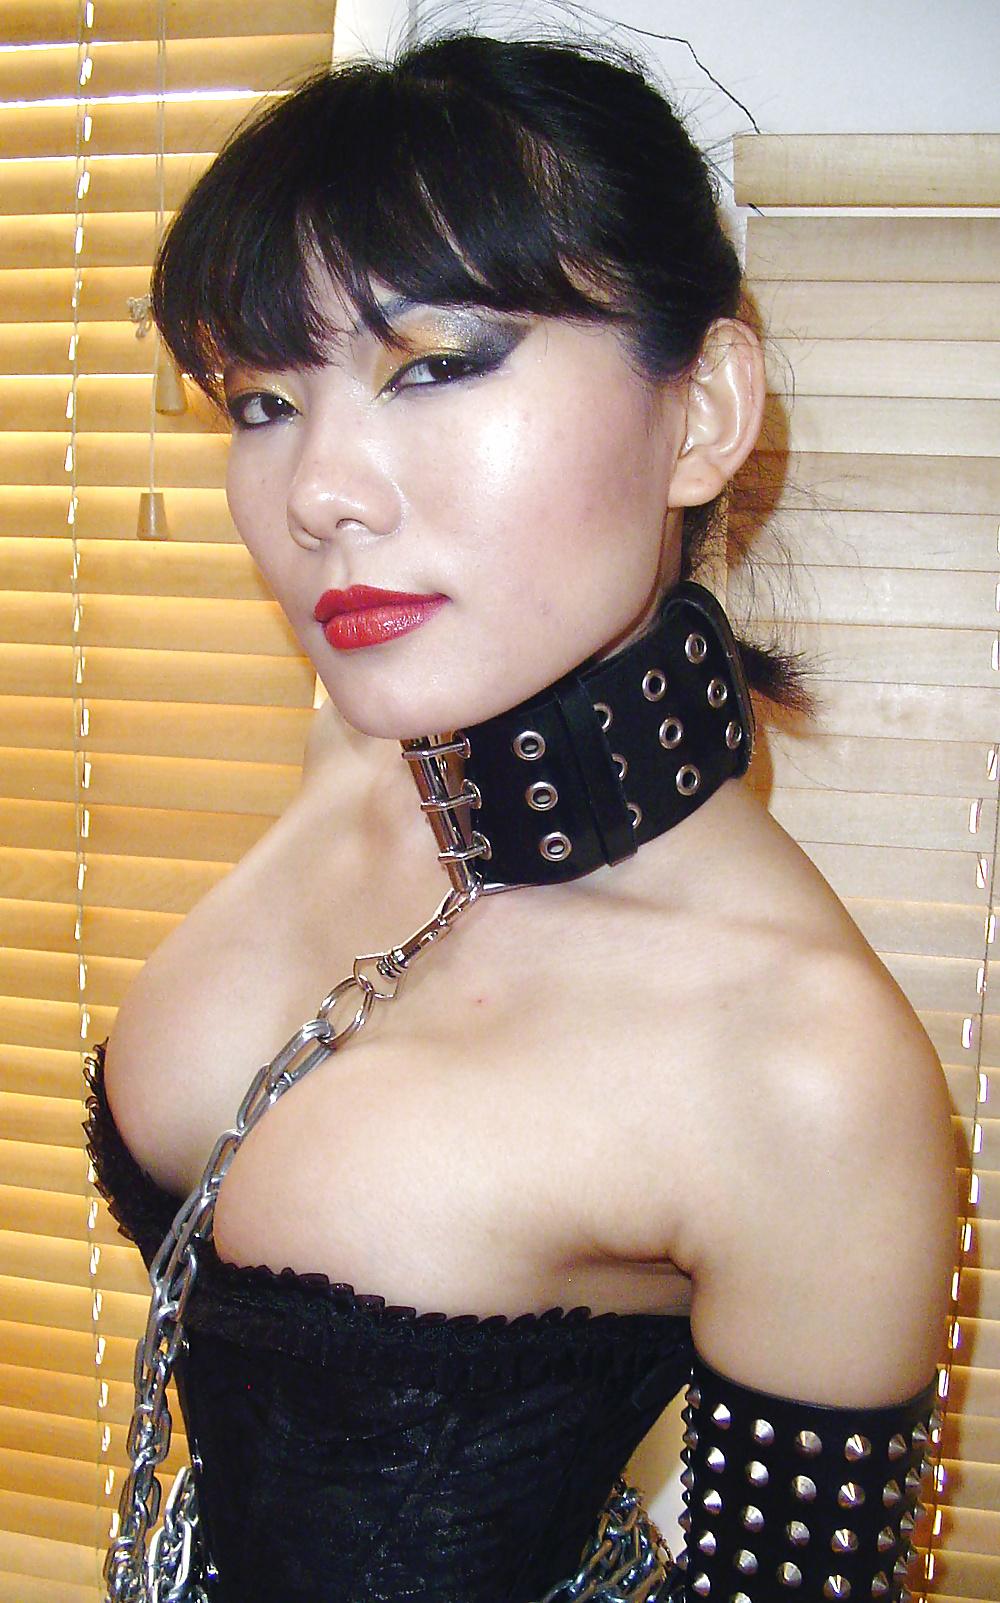 Layla shin hot romantic sex - 3 part 9